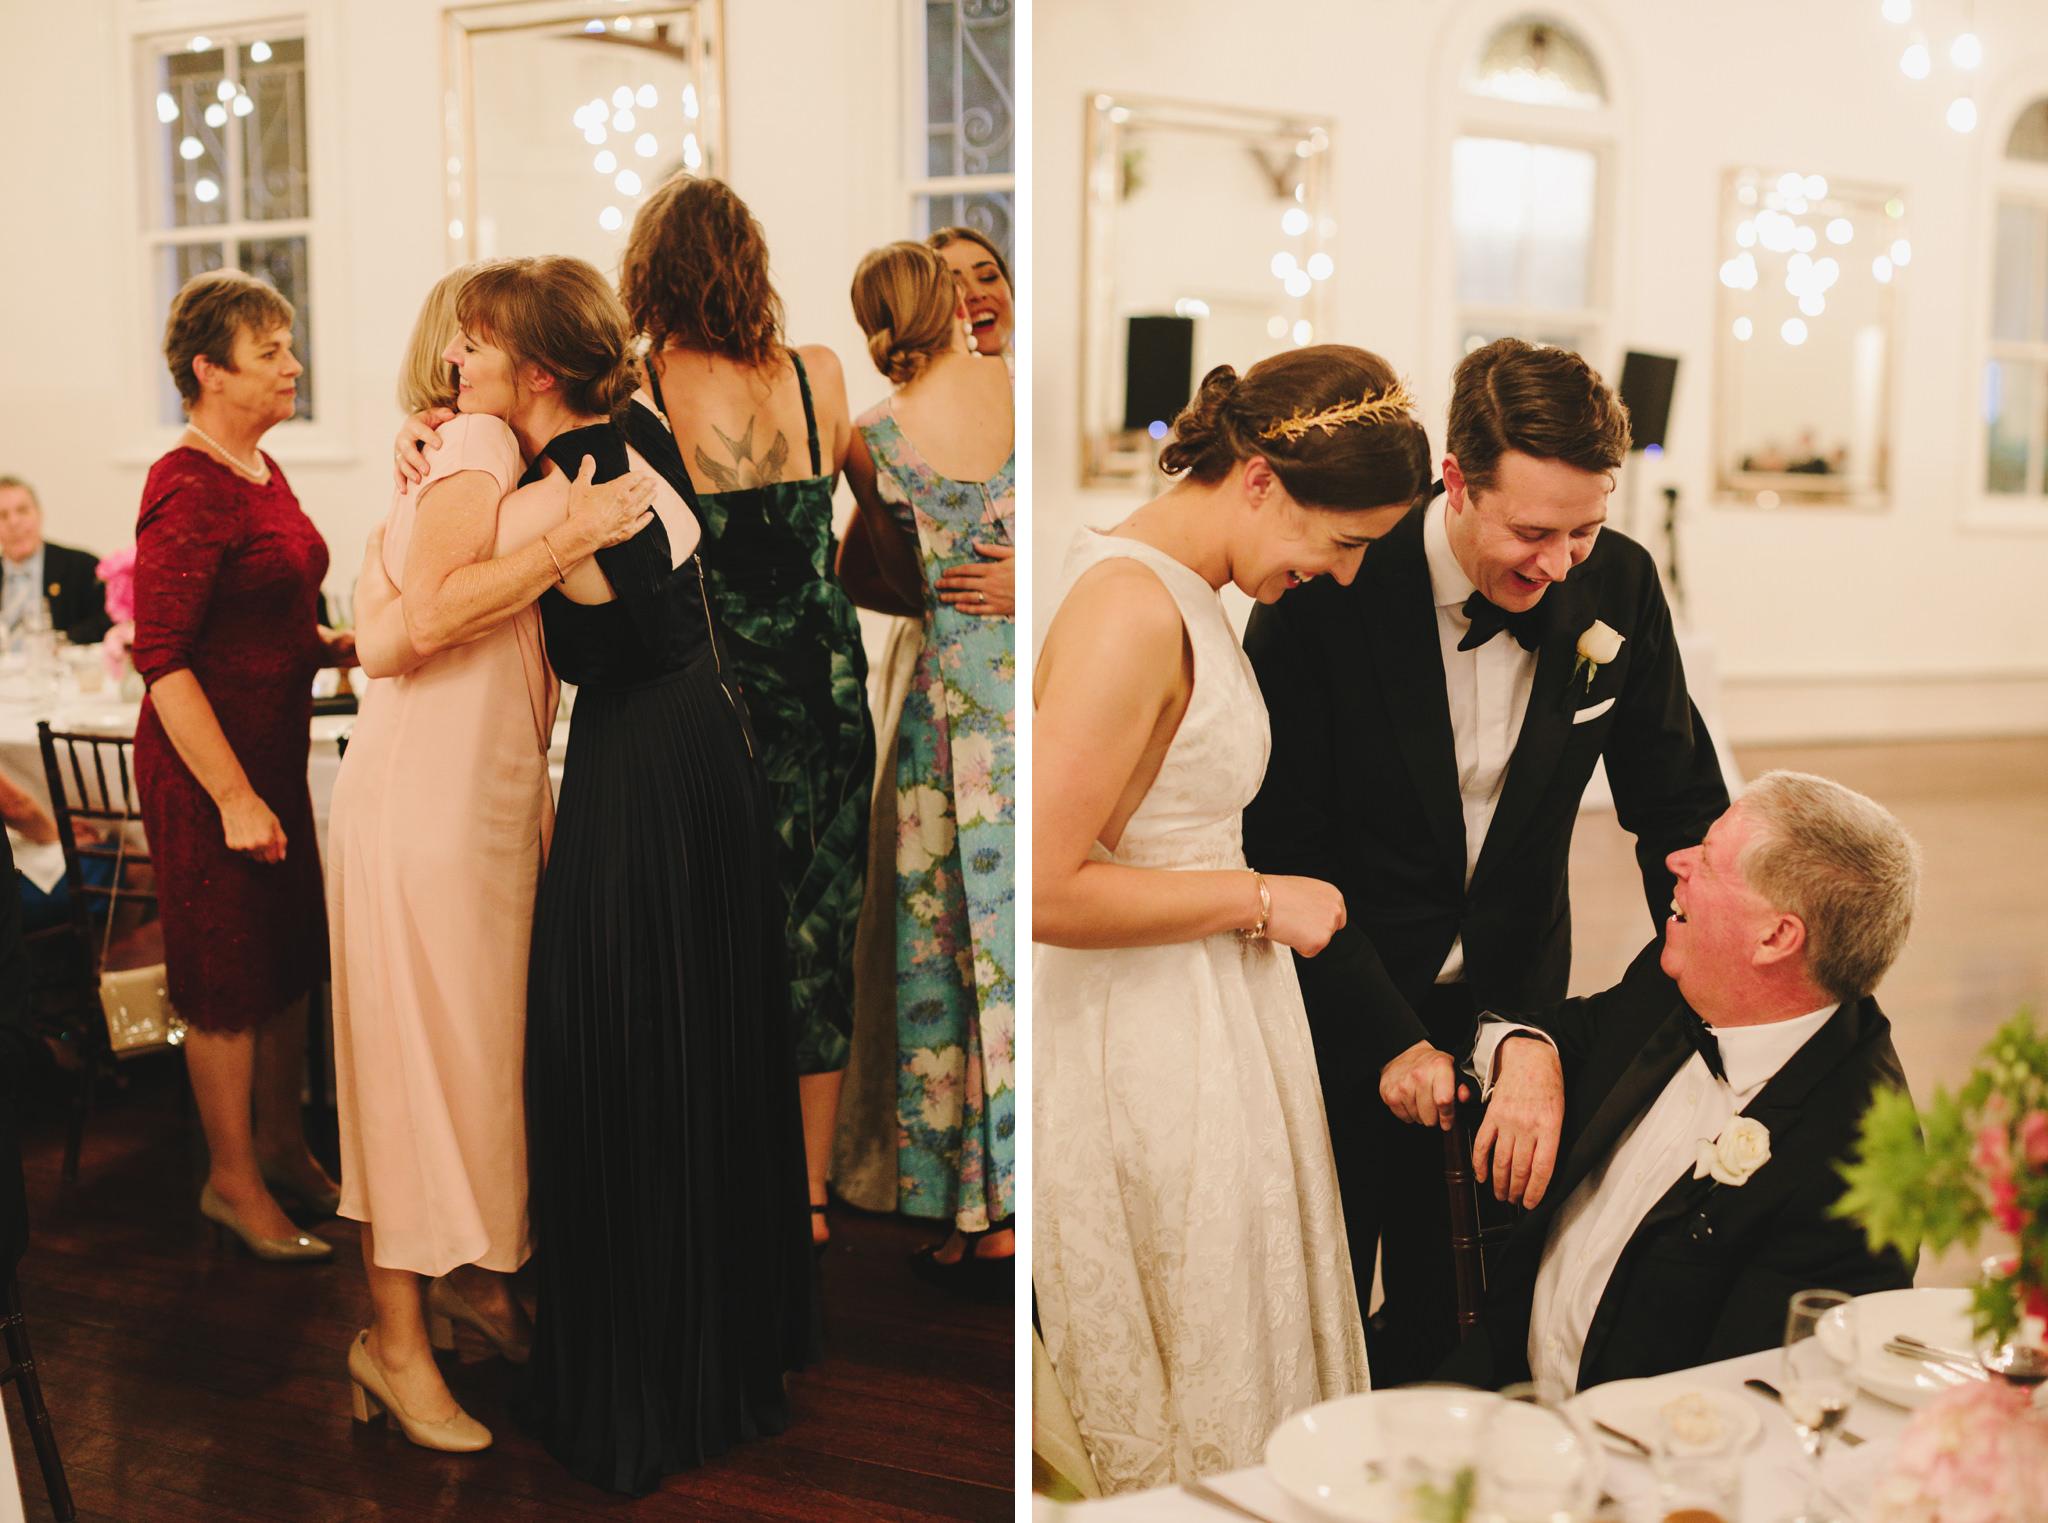 Abbotsford_Convent_Wedding_Peter_Anna113.JPG